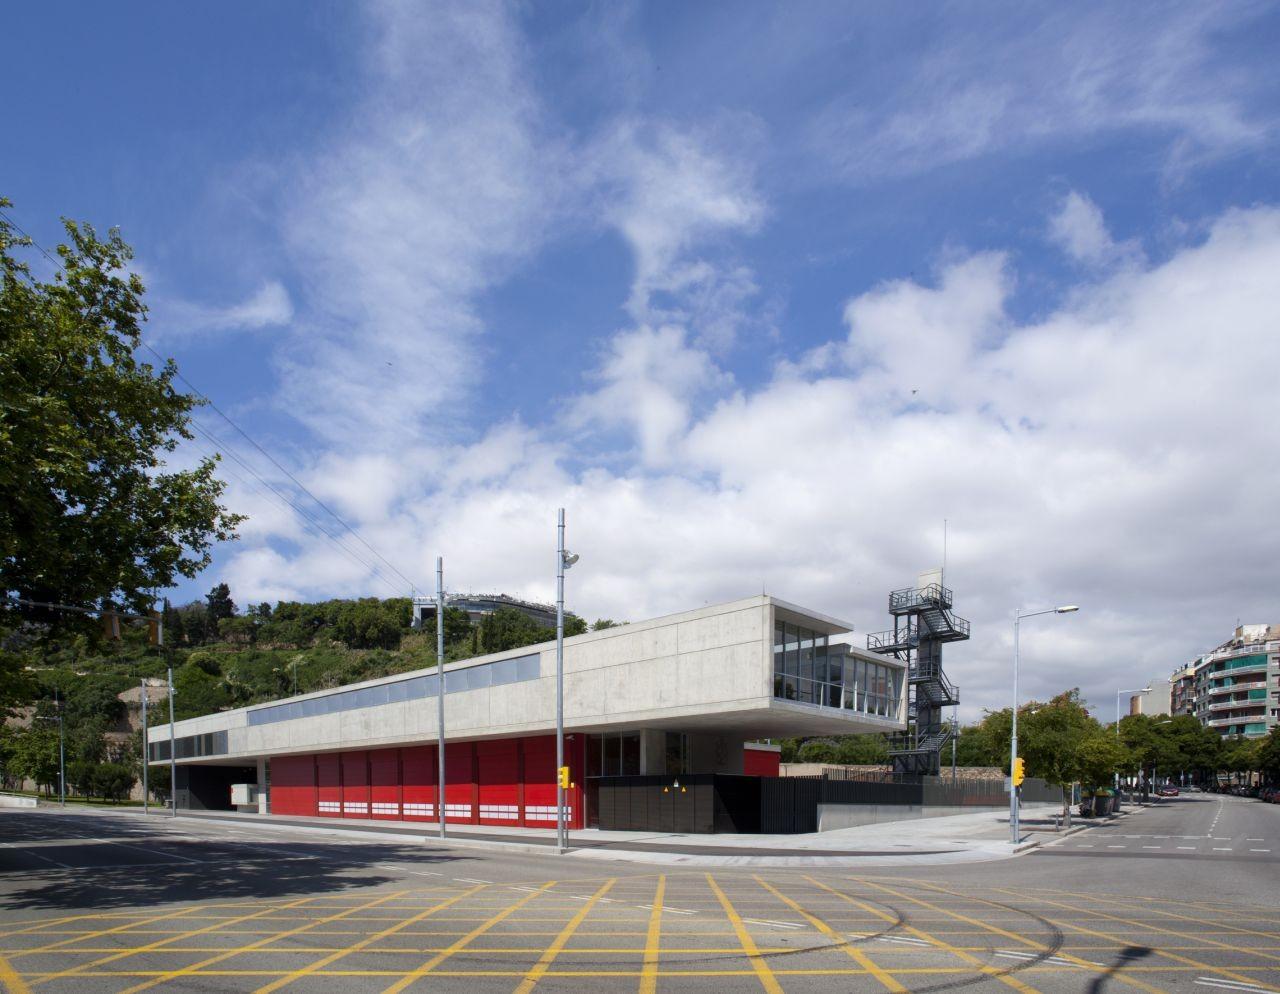 Montjuic Fire Station / Manuel Ruisánchez arquitecto, © Ferran Mateo